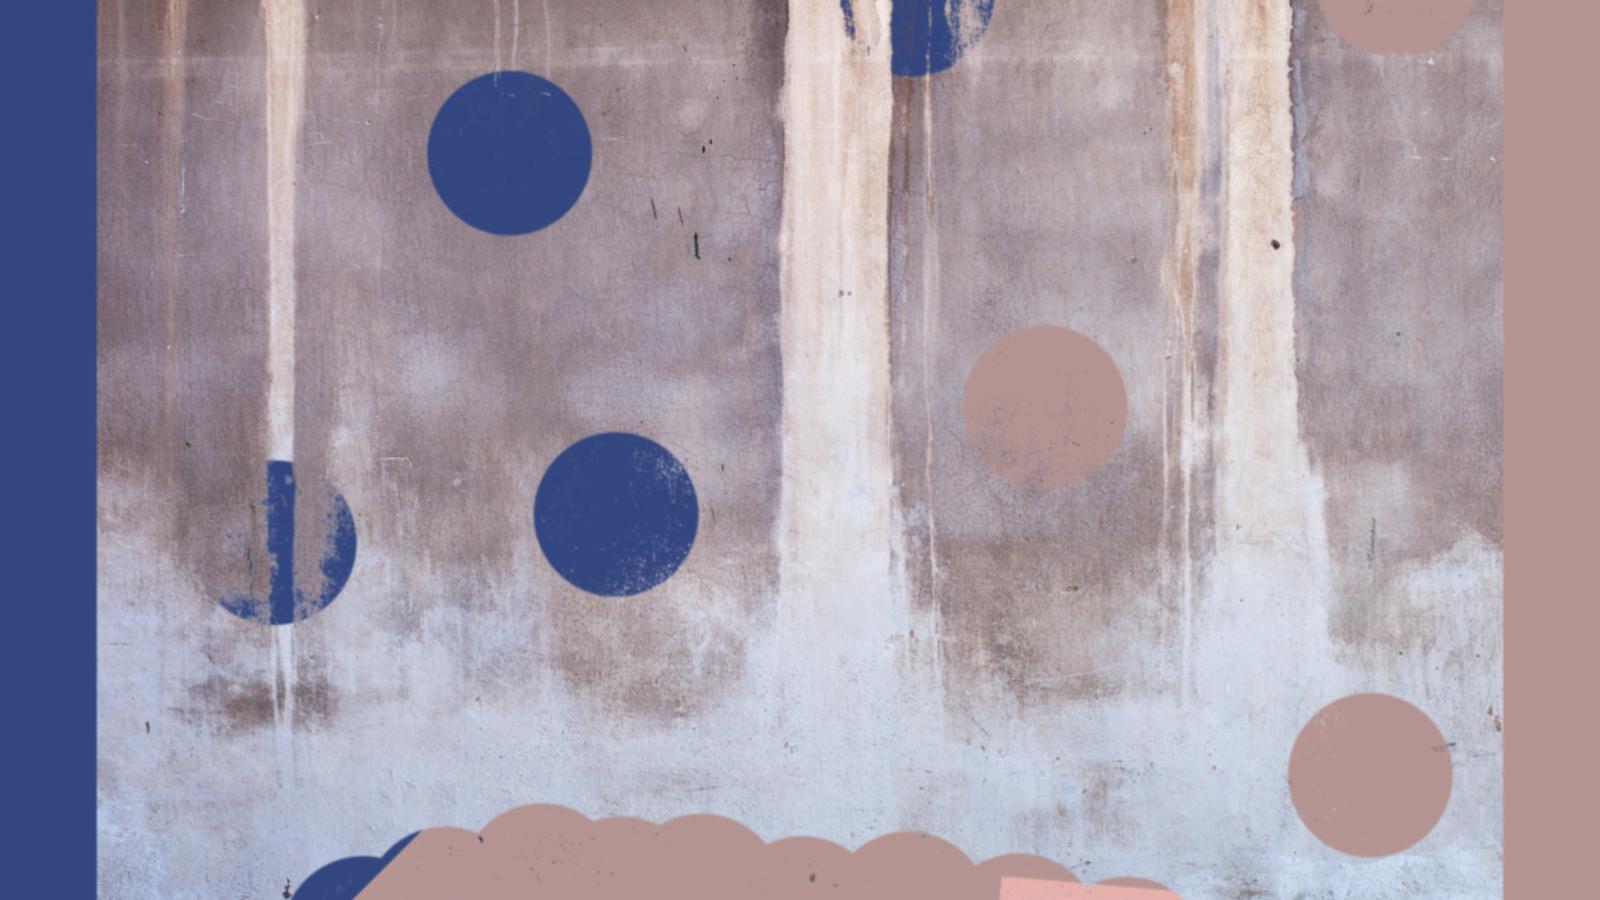 EX18 ARTWORK Butane & Riko Forinson - Sorry For Everything EP - Extrasketch